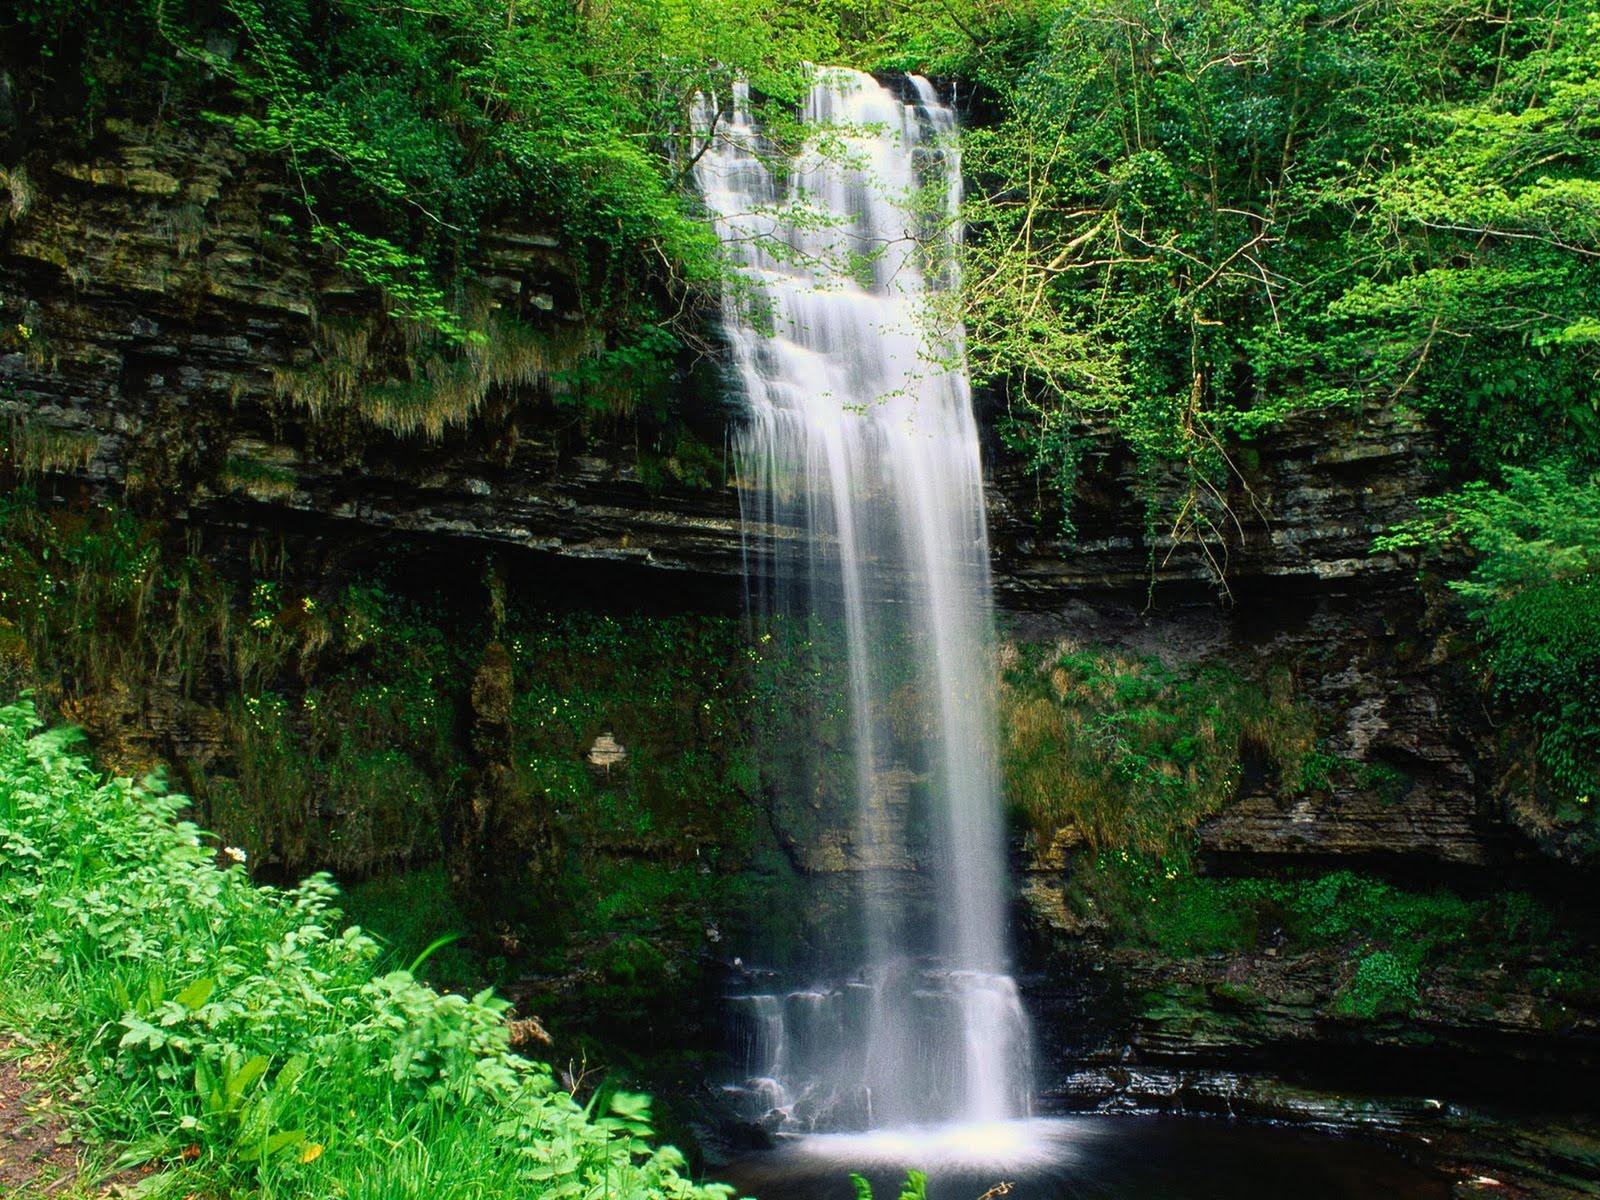 Wallpaper Provider: Waterfall Wallpapers